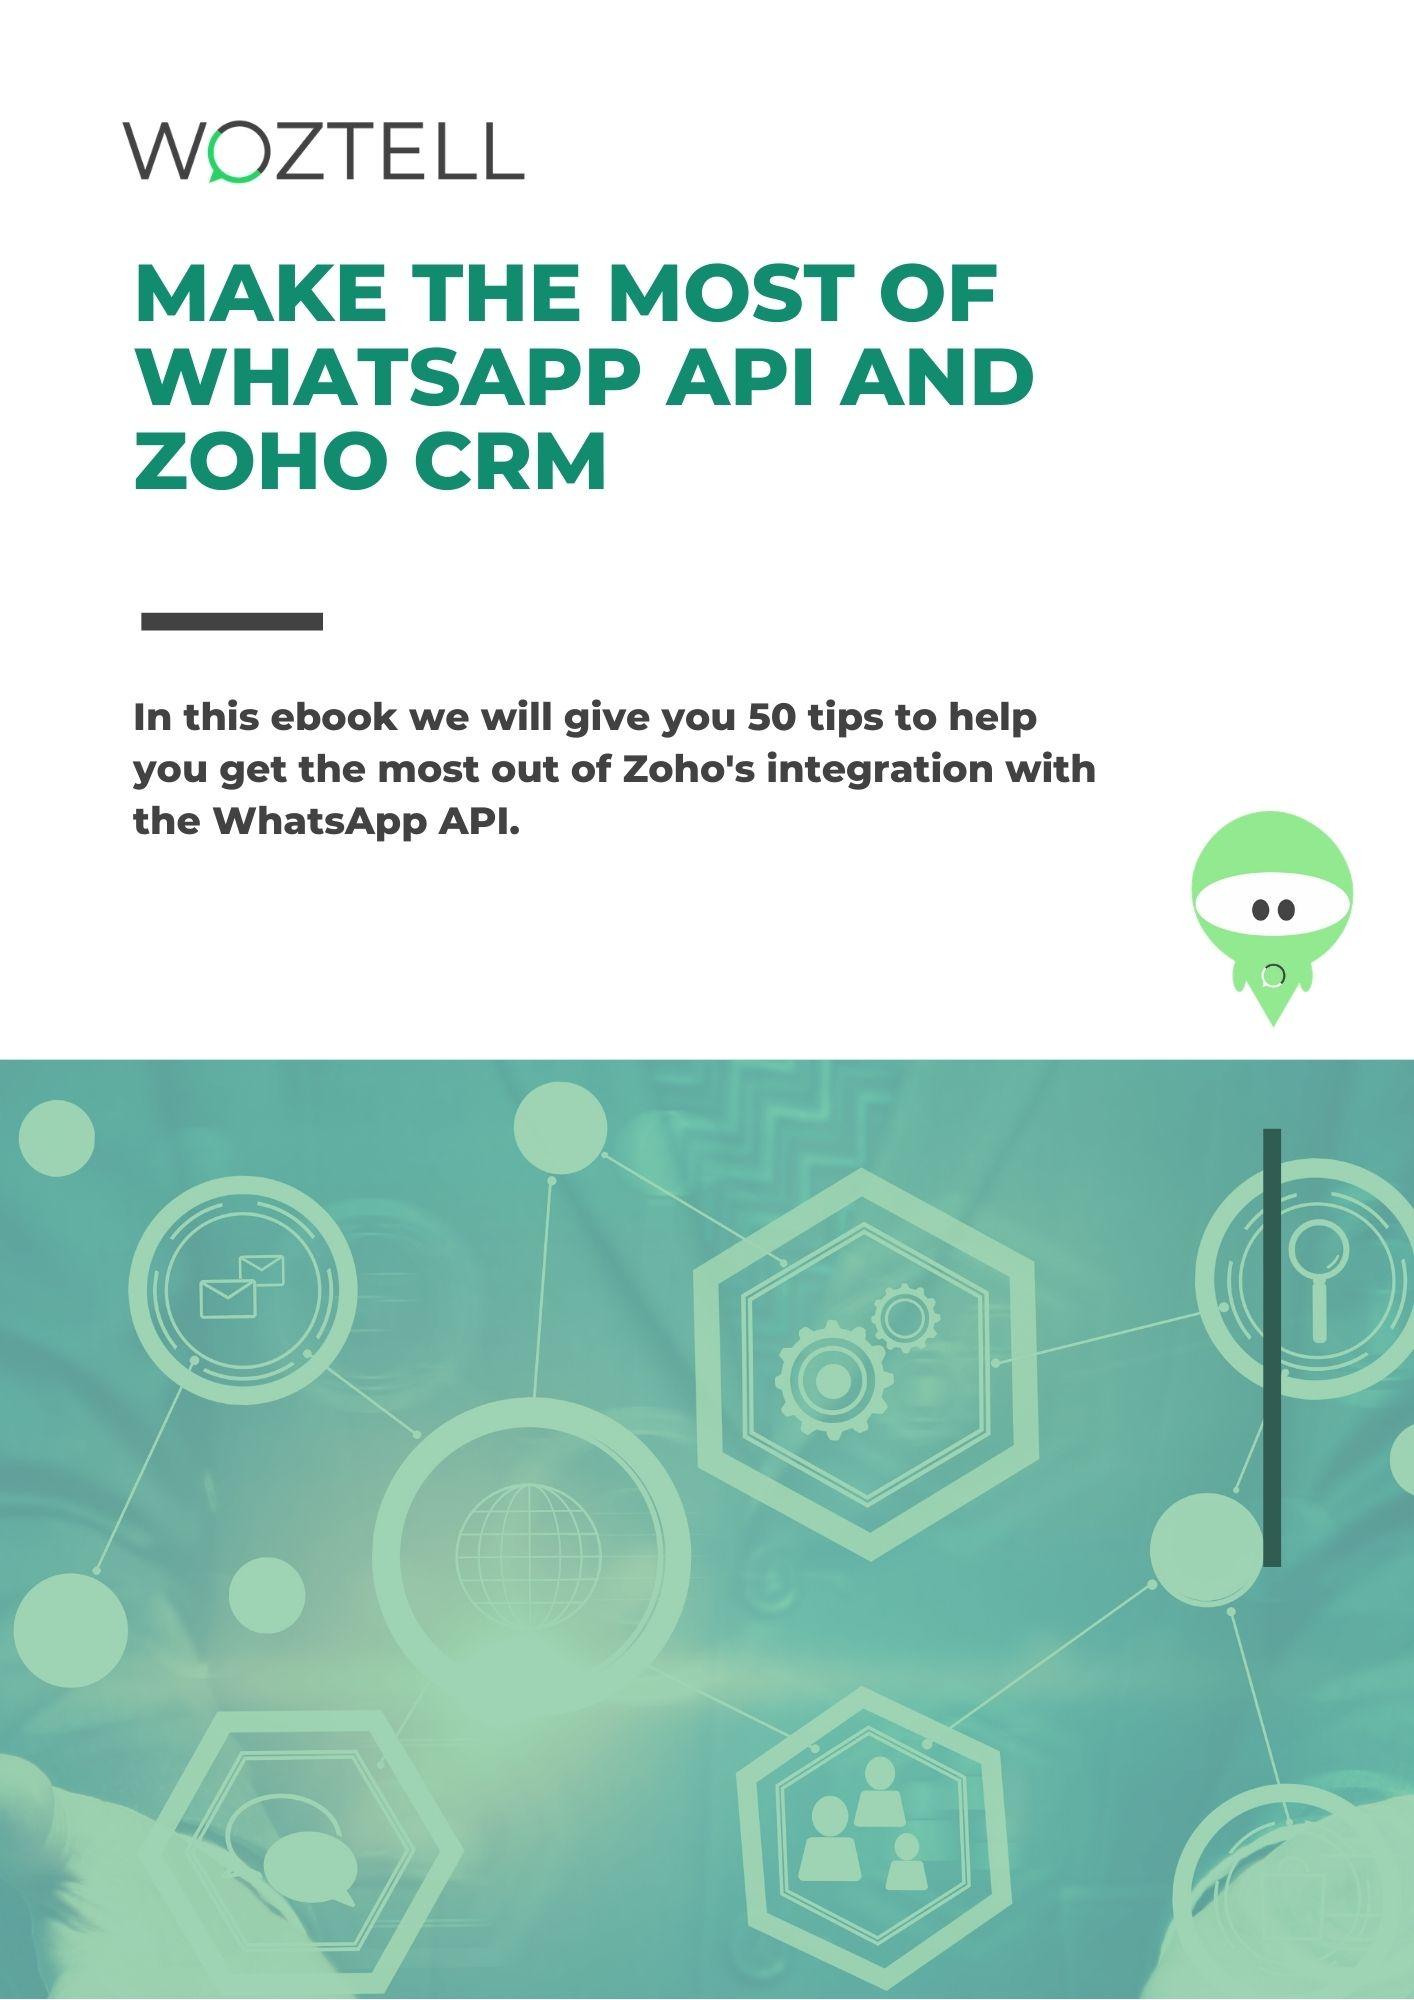 Make the most of WhatsApp API and Zoho CRM